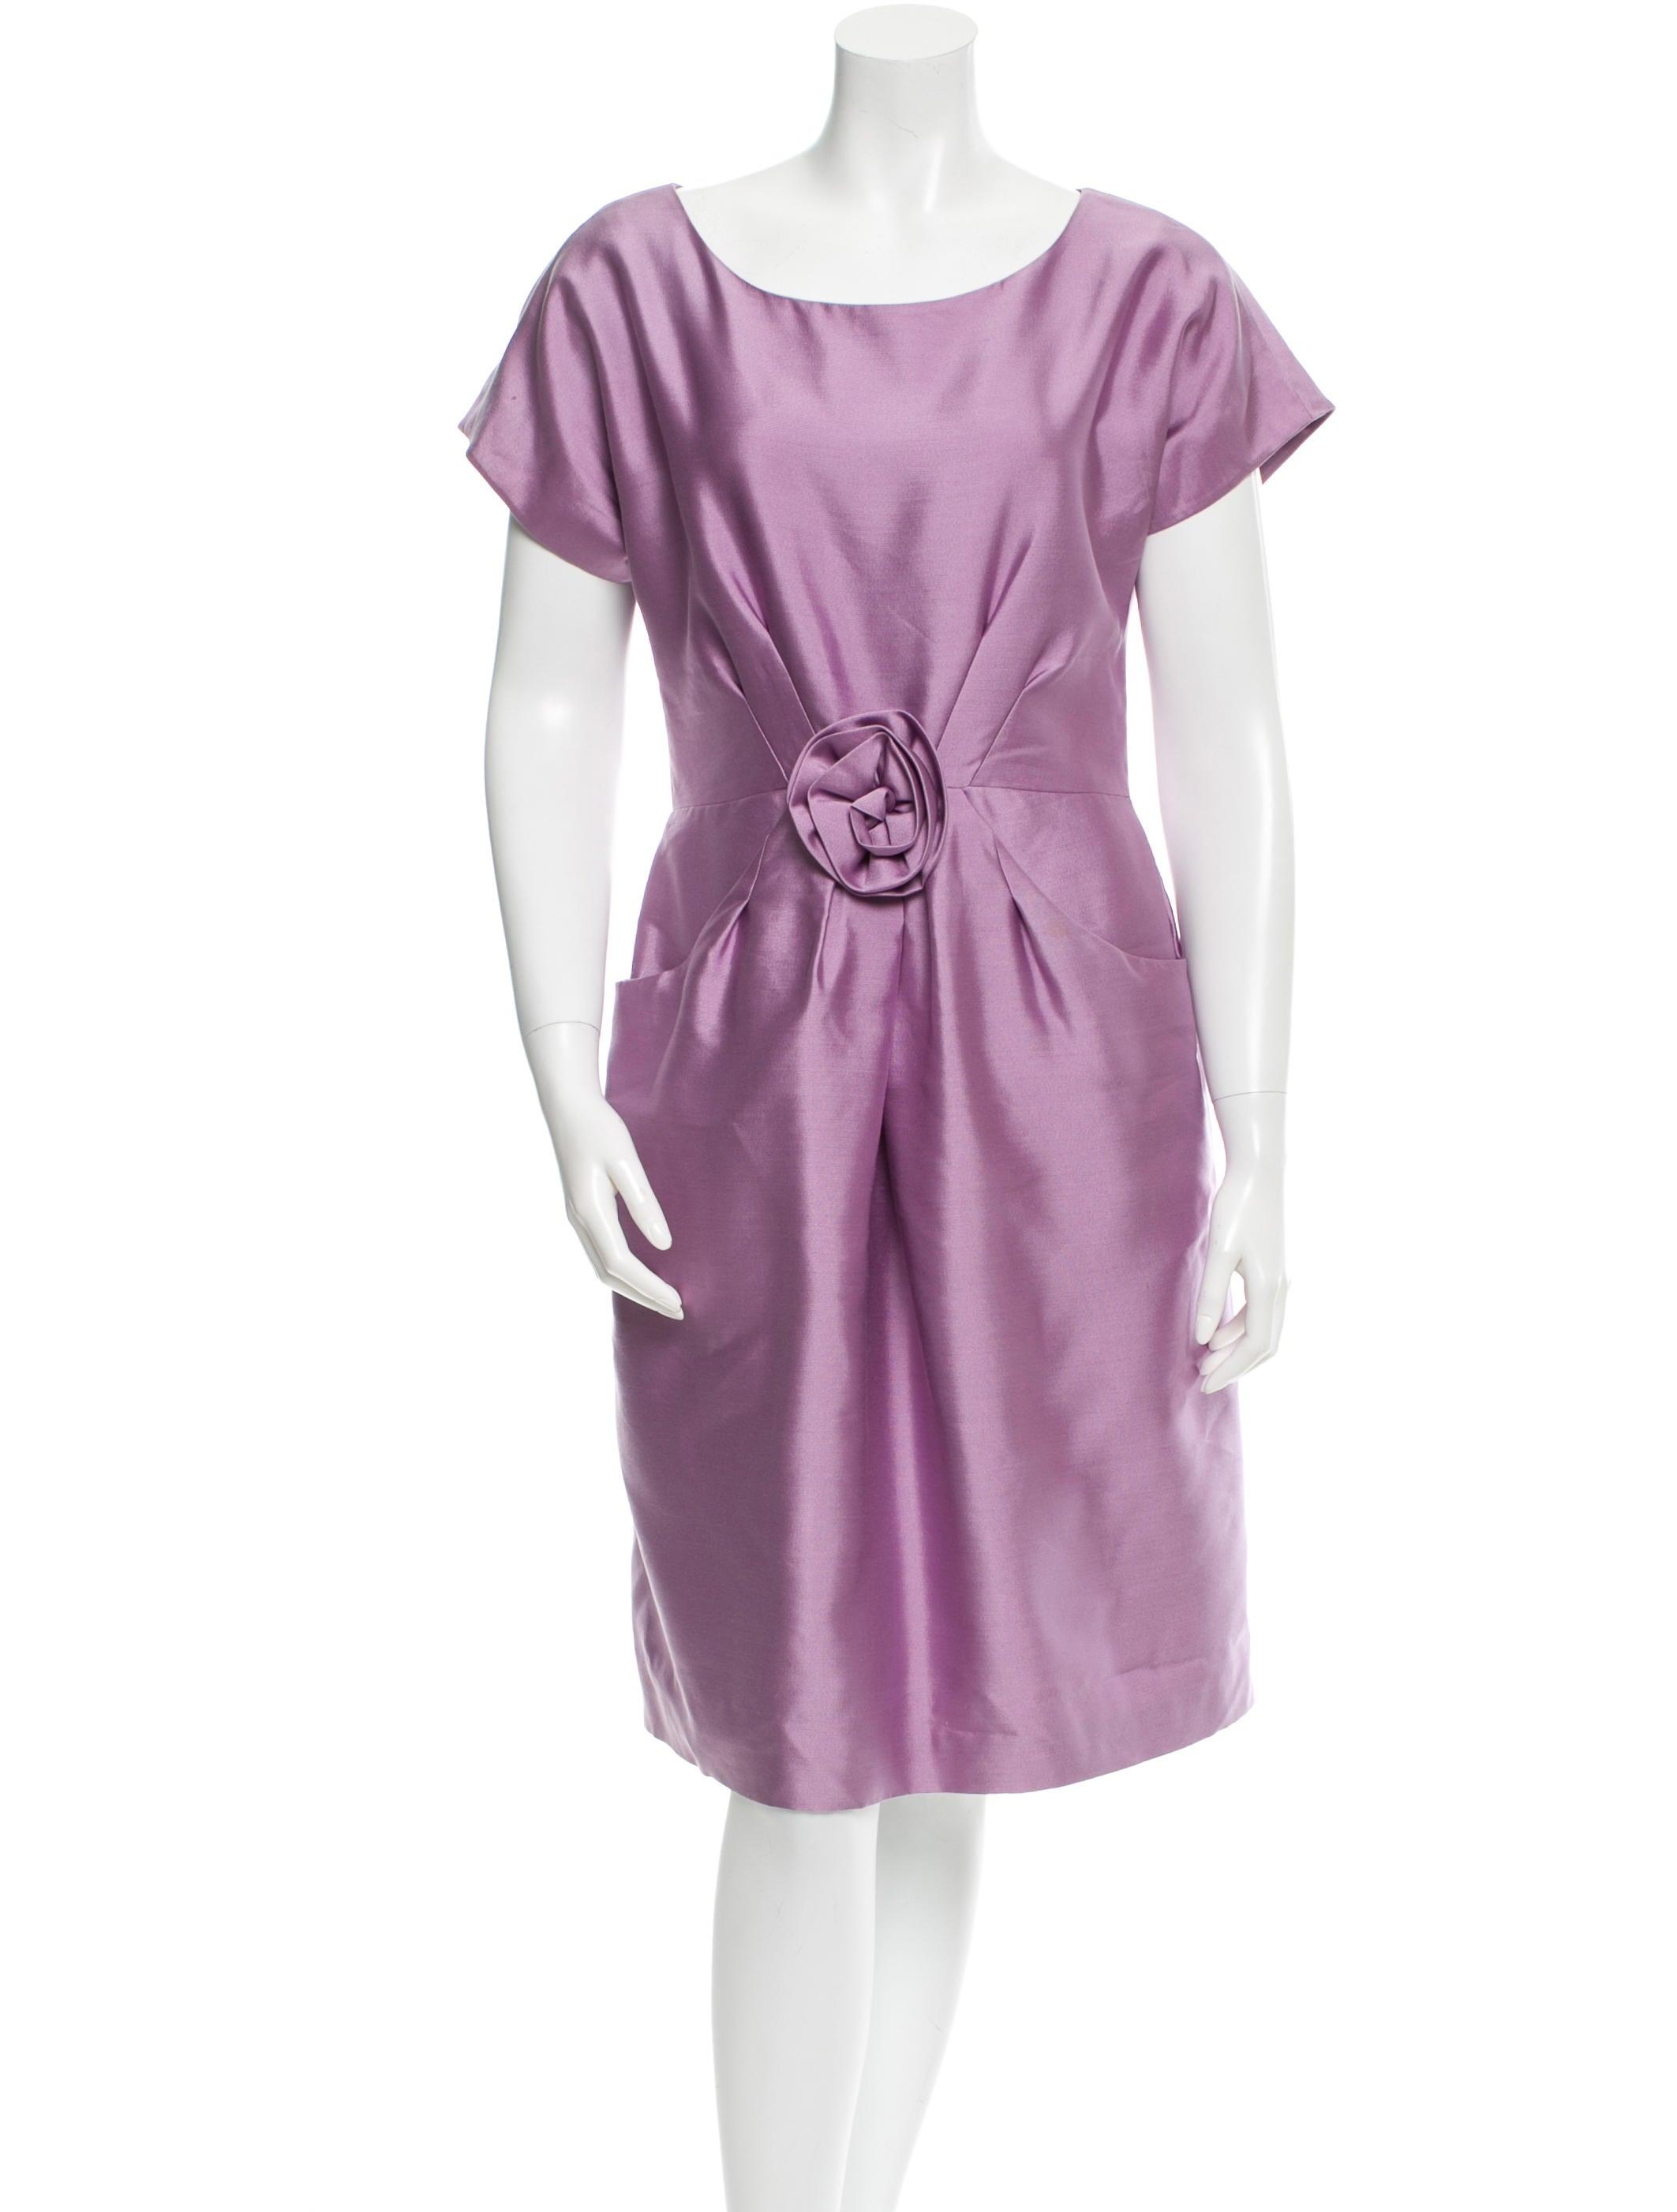 Kate Spade New York Short Sleeve Dress Clothing